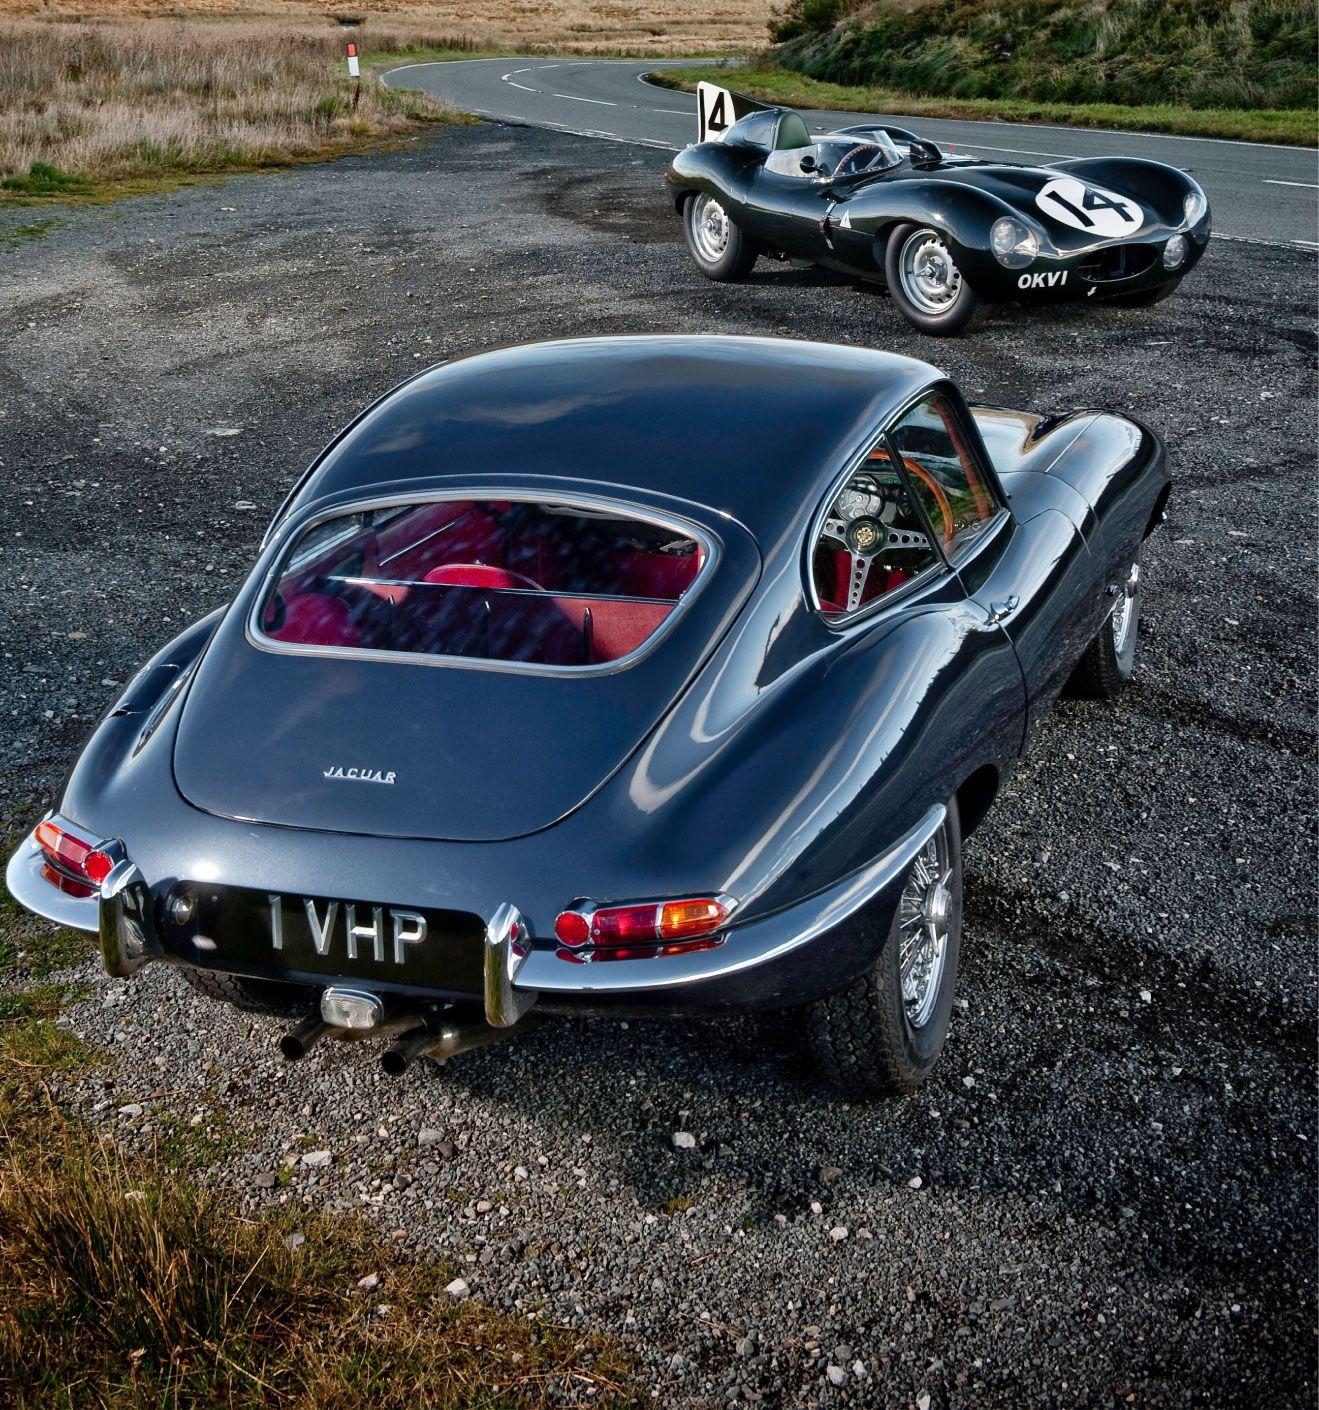 www.classic-motor-cars.co.uk images site tmp-hero-4.jpg | Jag ...